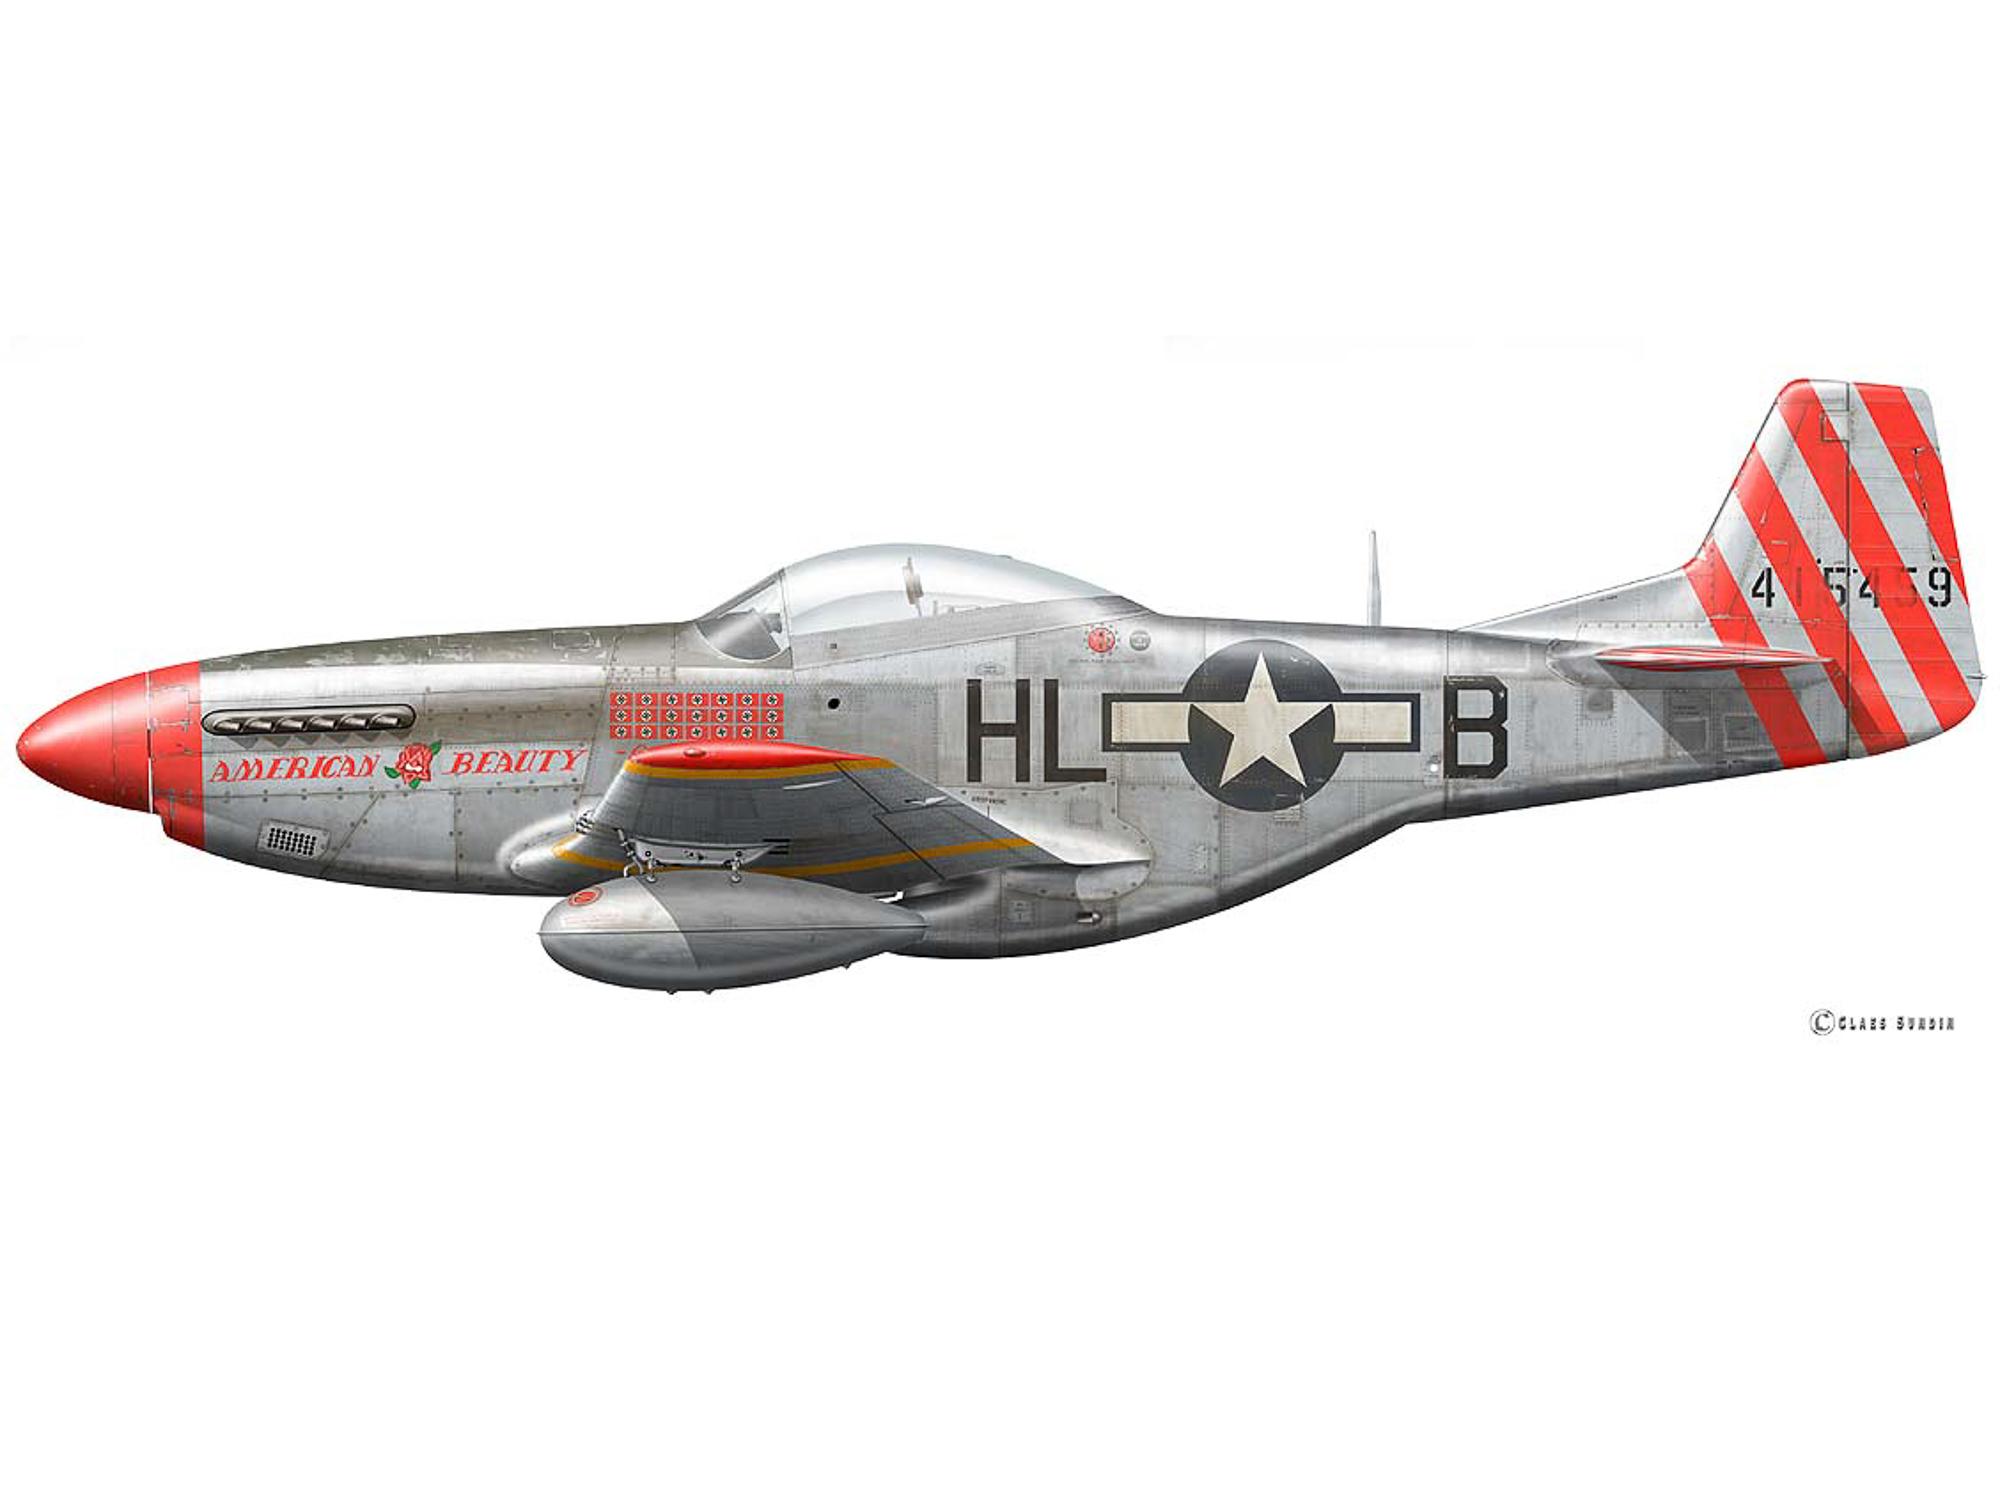 P-51D – American Beauty – 44-15459